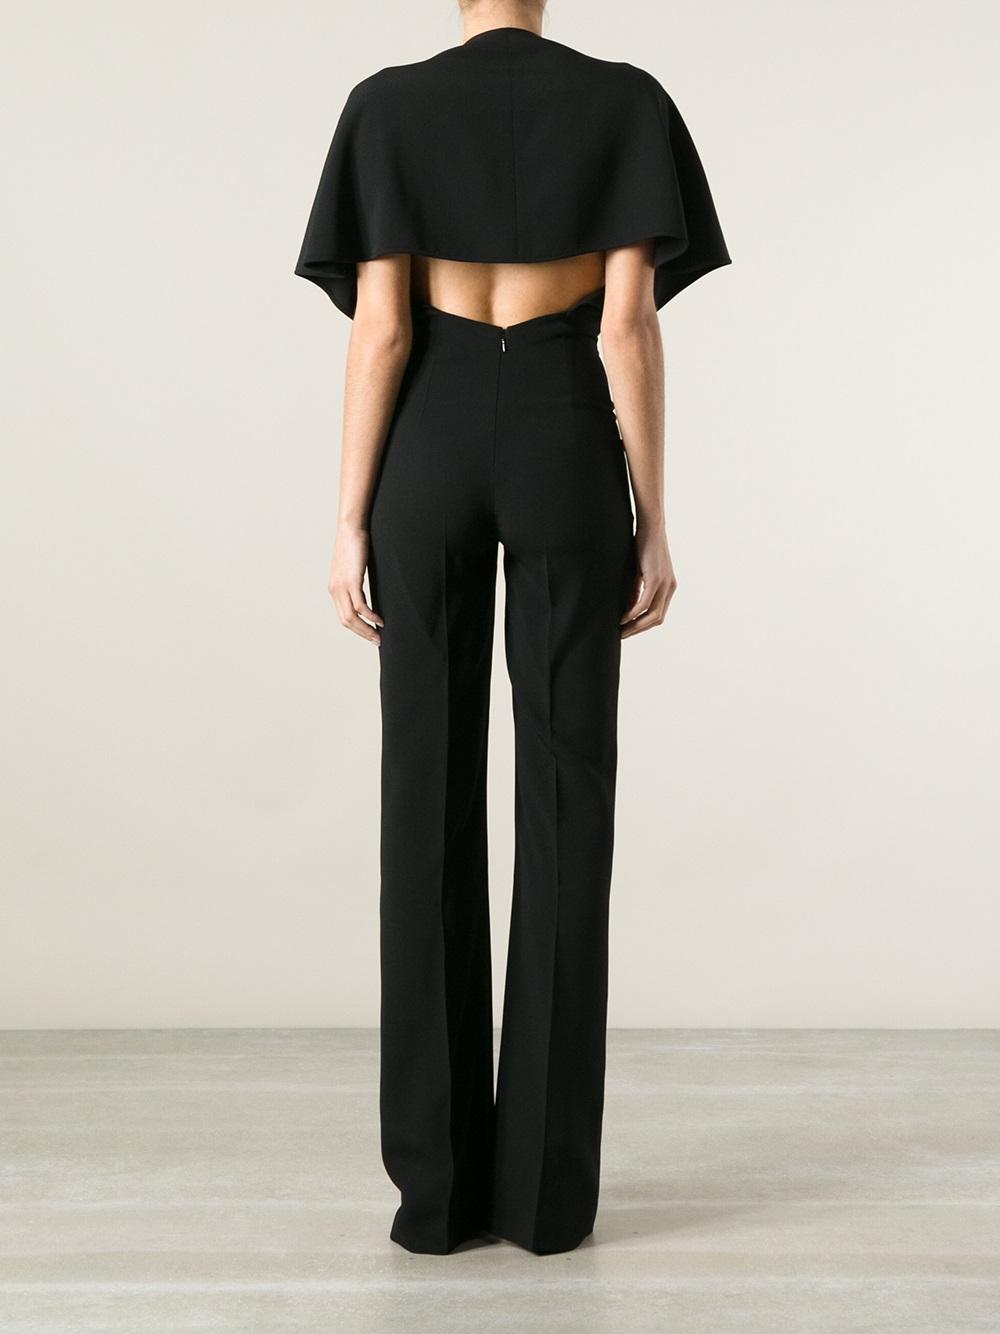 Stella mccartney Flared Trouser Jumpsuit in Black   Lyst